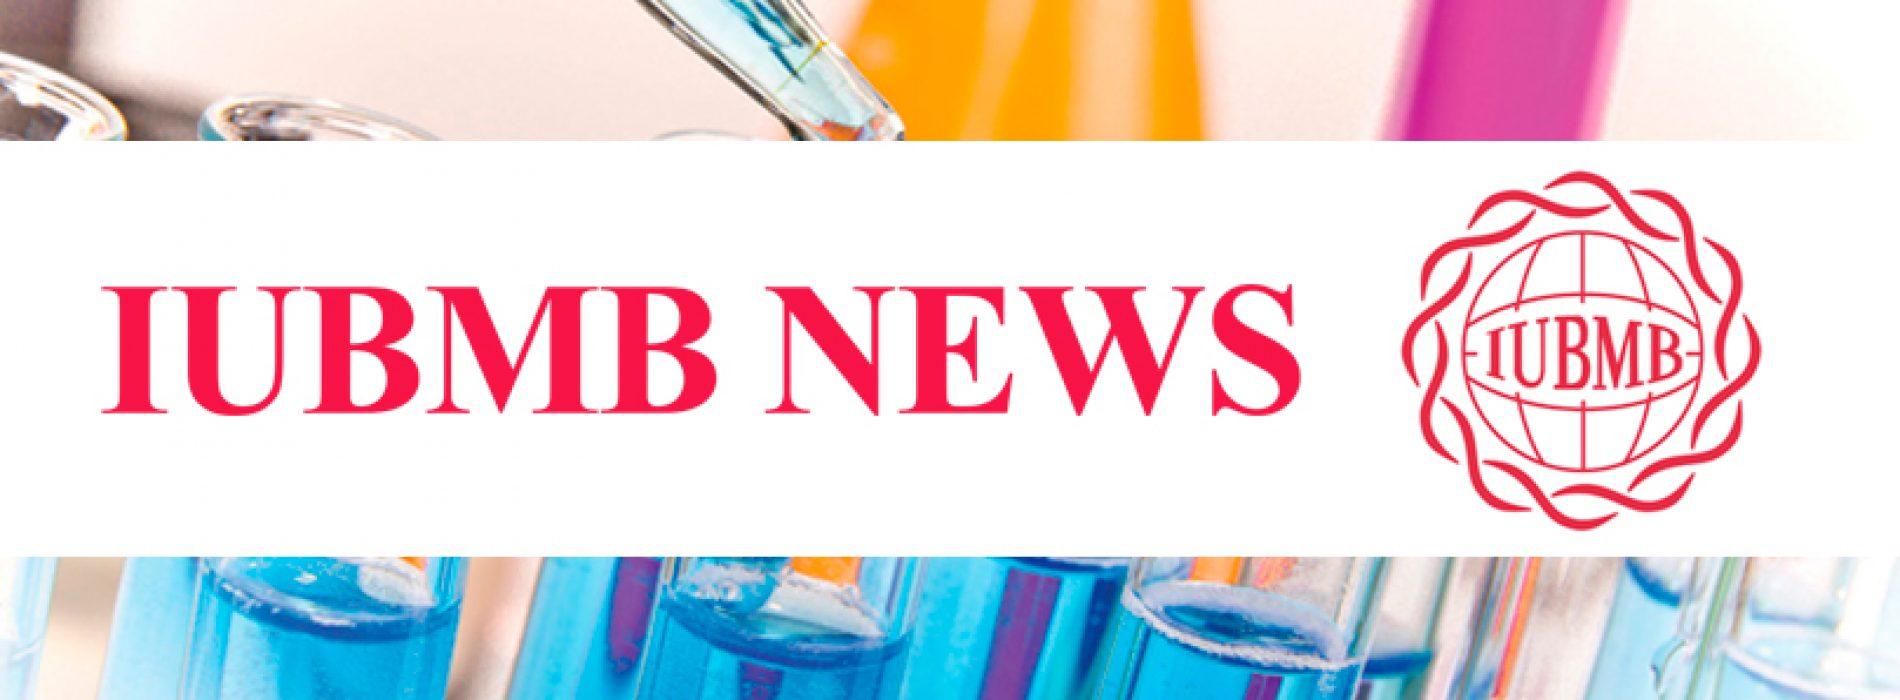 2021 IUBMB January News